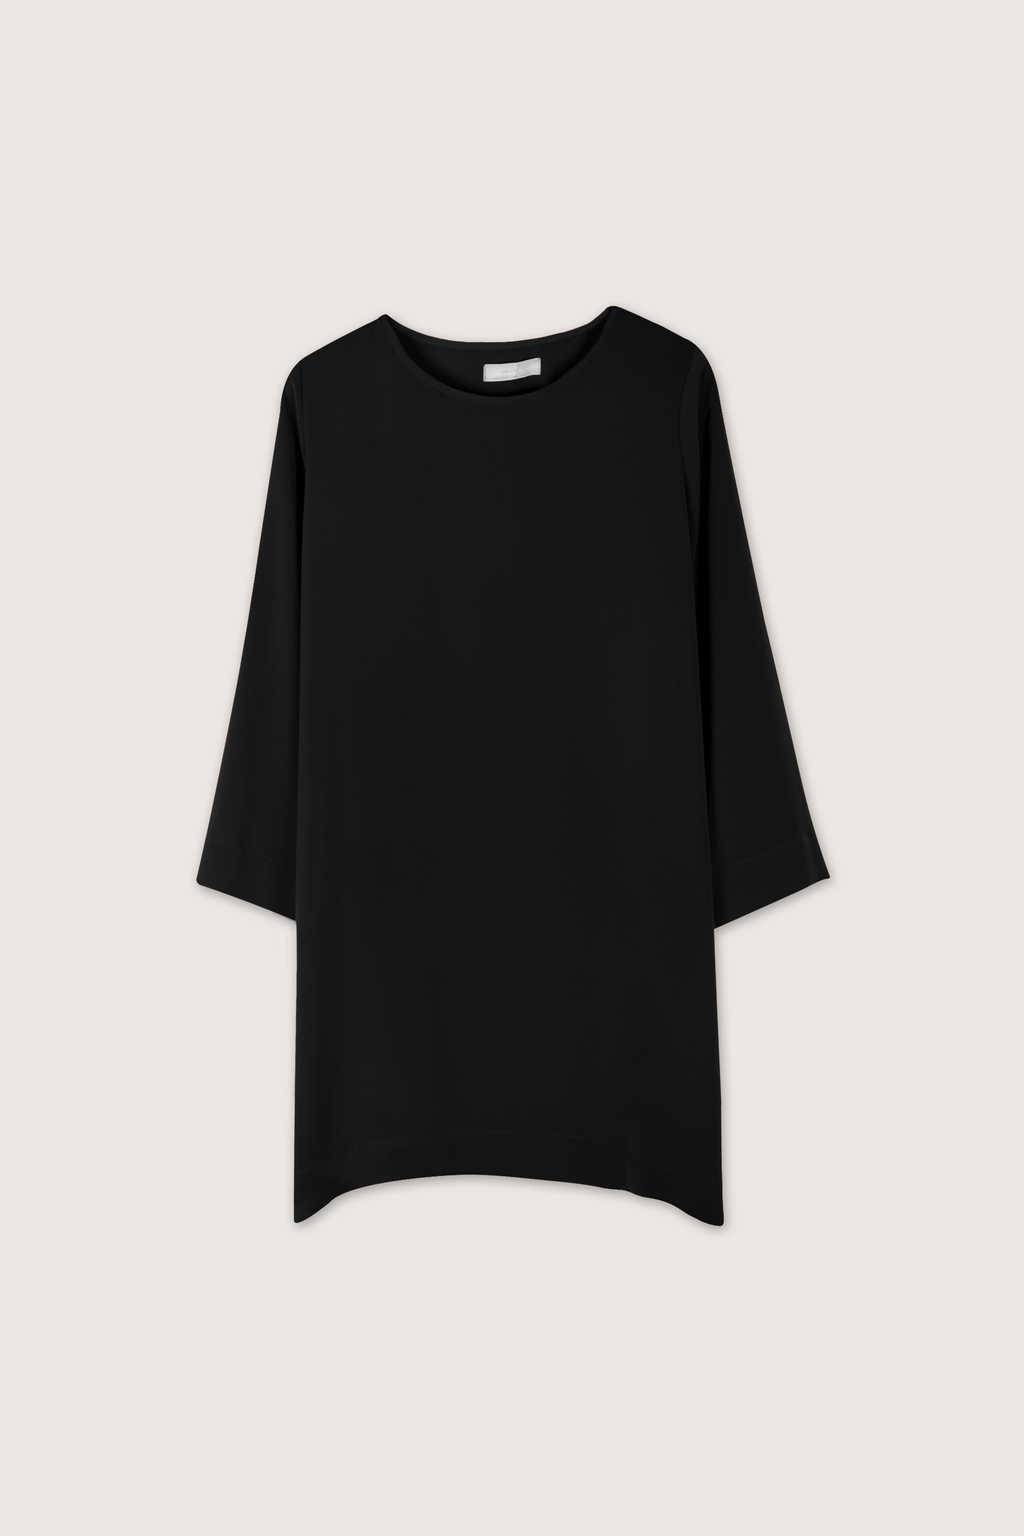 Dress 1670 Black 9